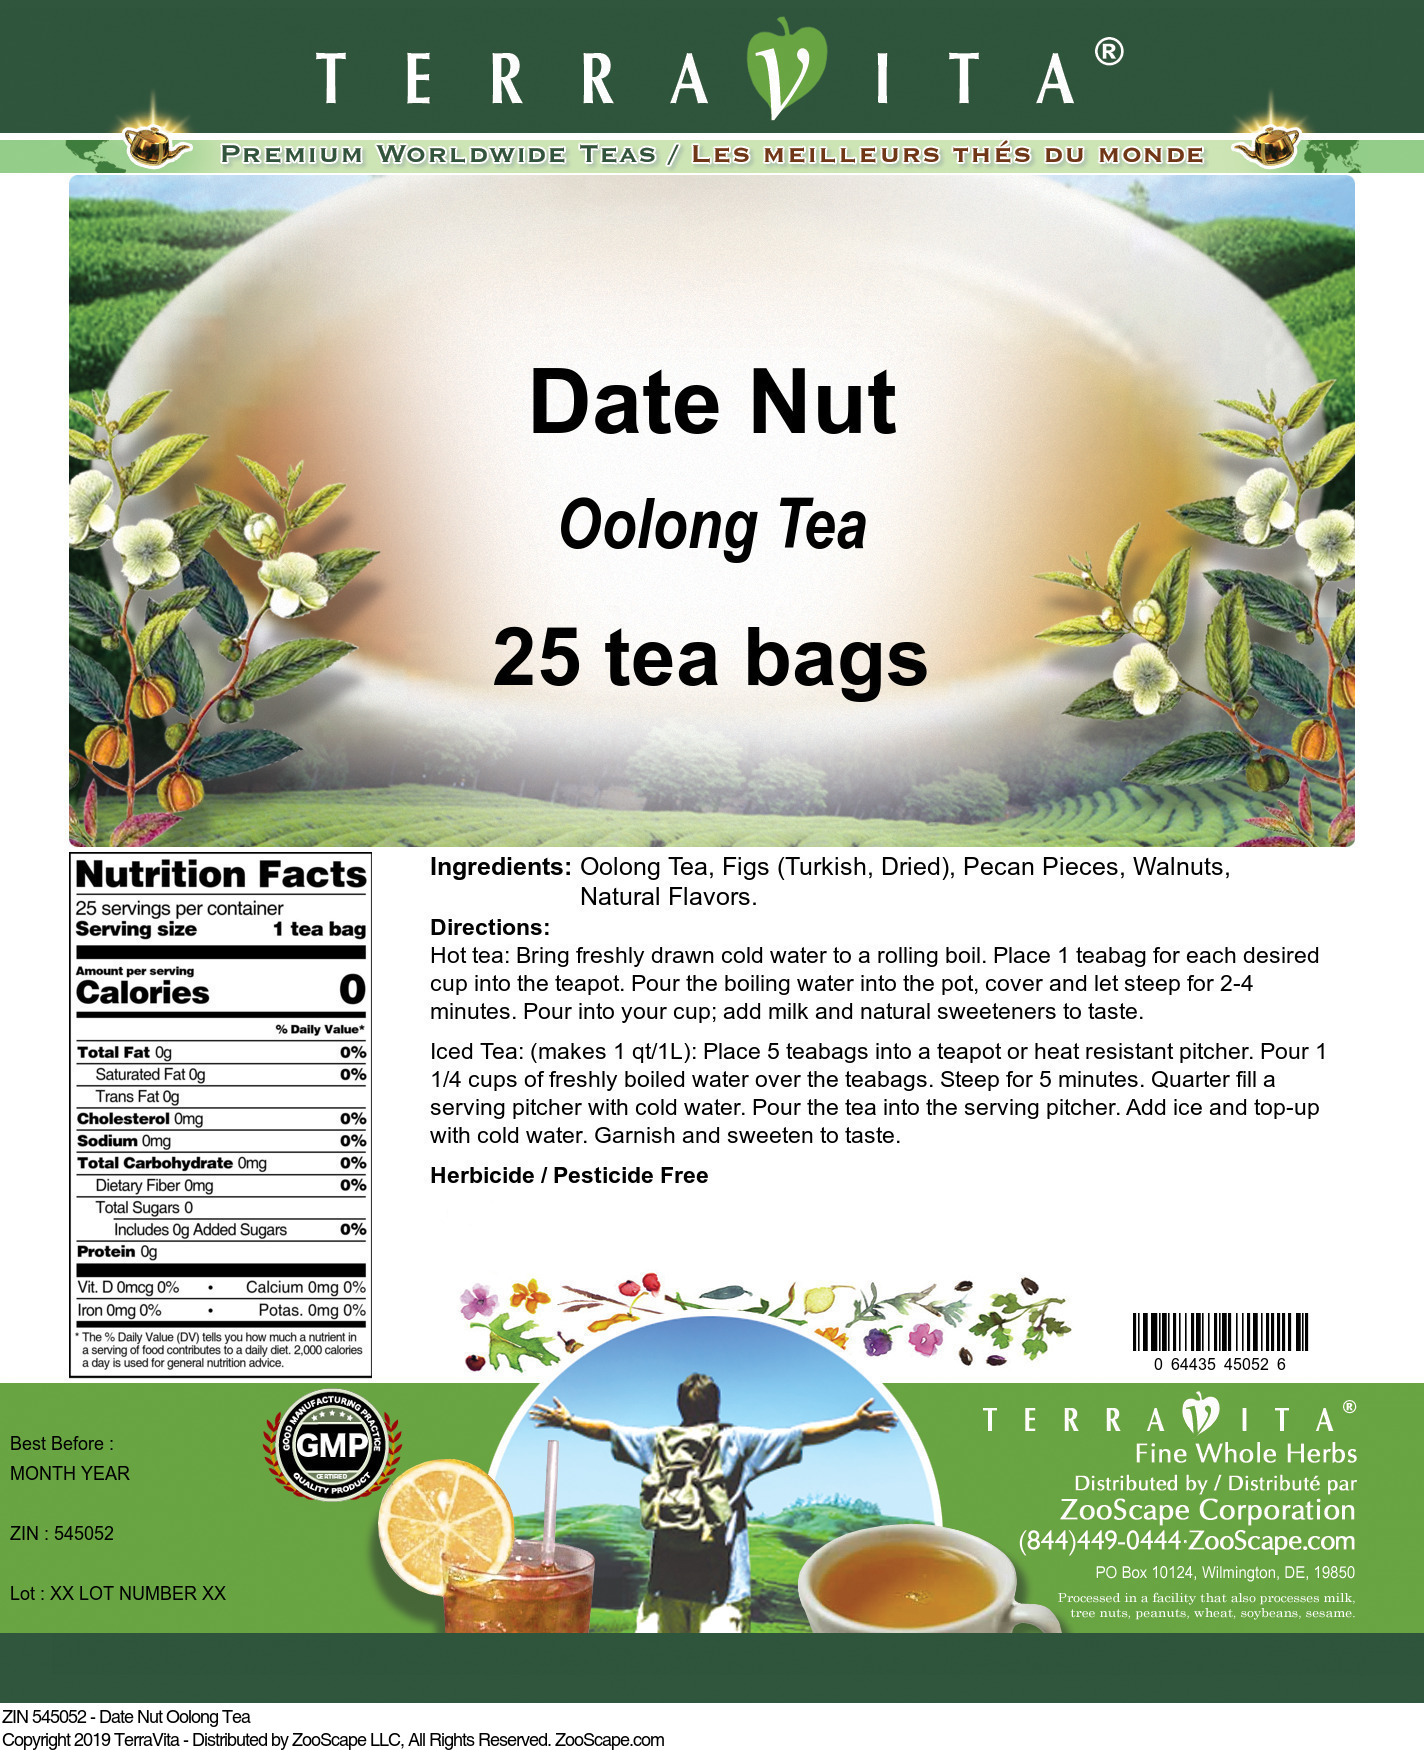 Date Nut Oolong Tea